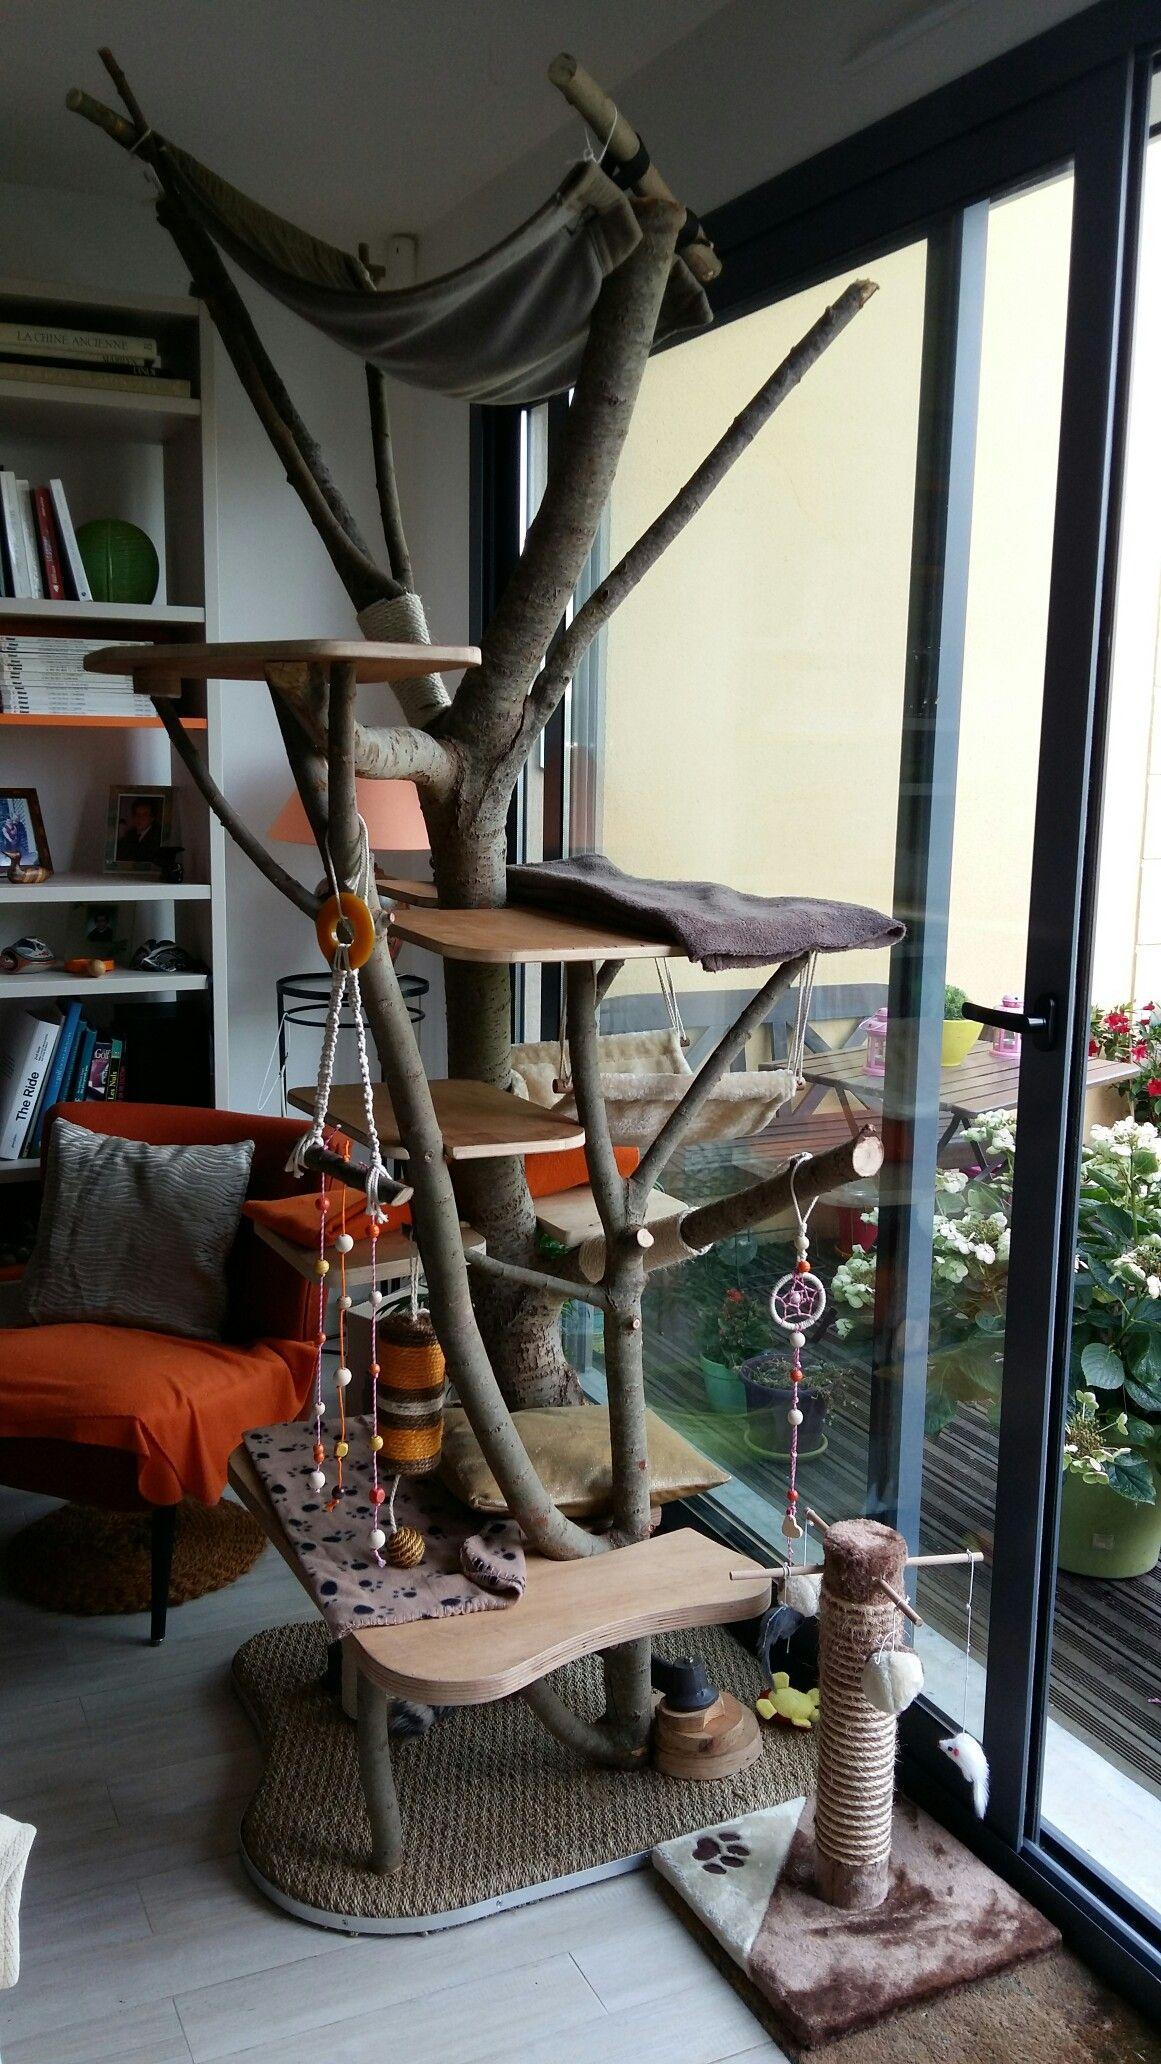 diy notre arbre chat maison chat cat tree cat. Black Bedroom Furniture Sets. Home Design Ideas